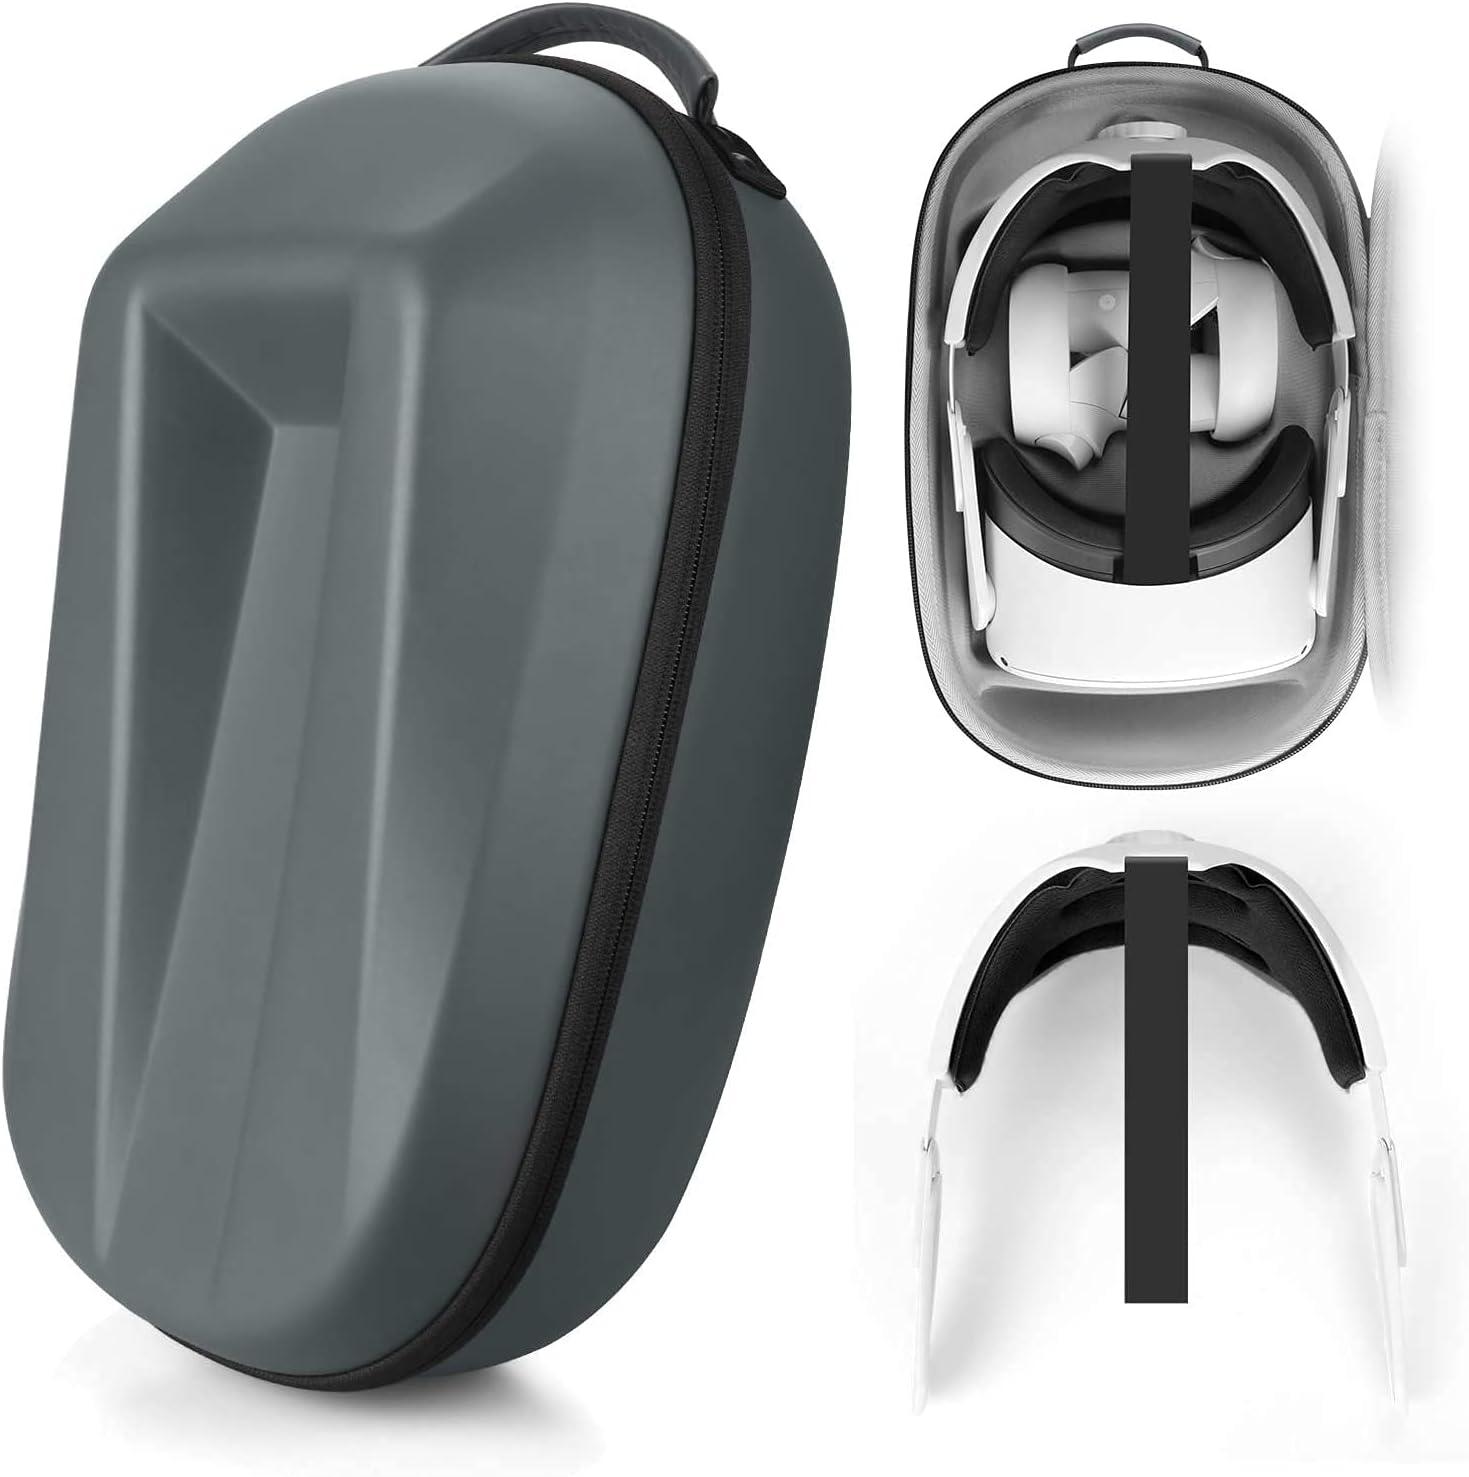 Esimen Hard Case for Oculus Quest 2 with Adjustable Head Strap Set Accessories